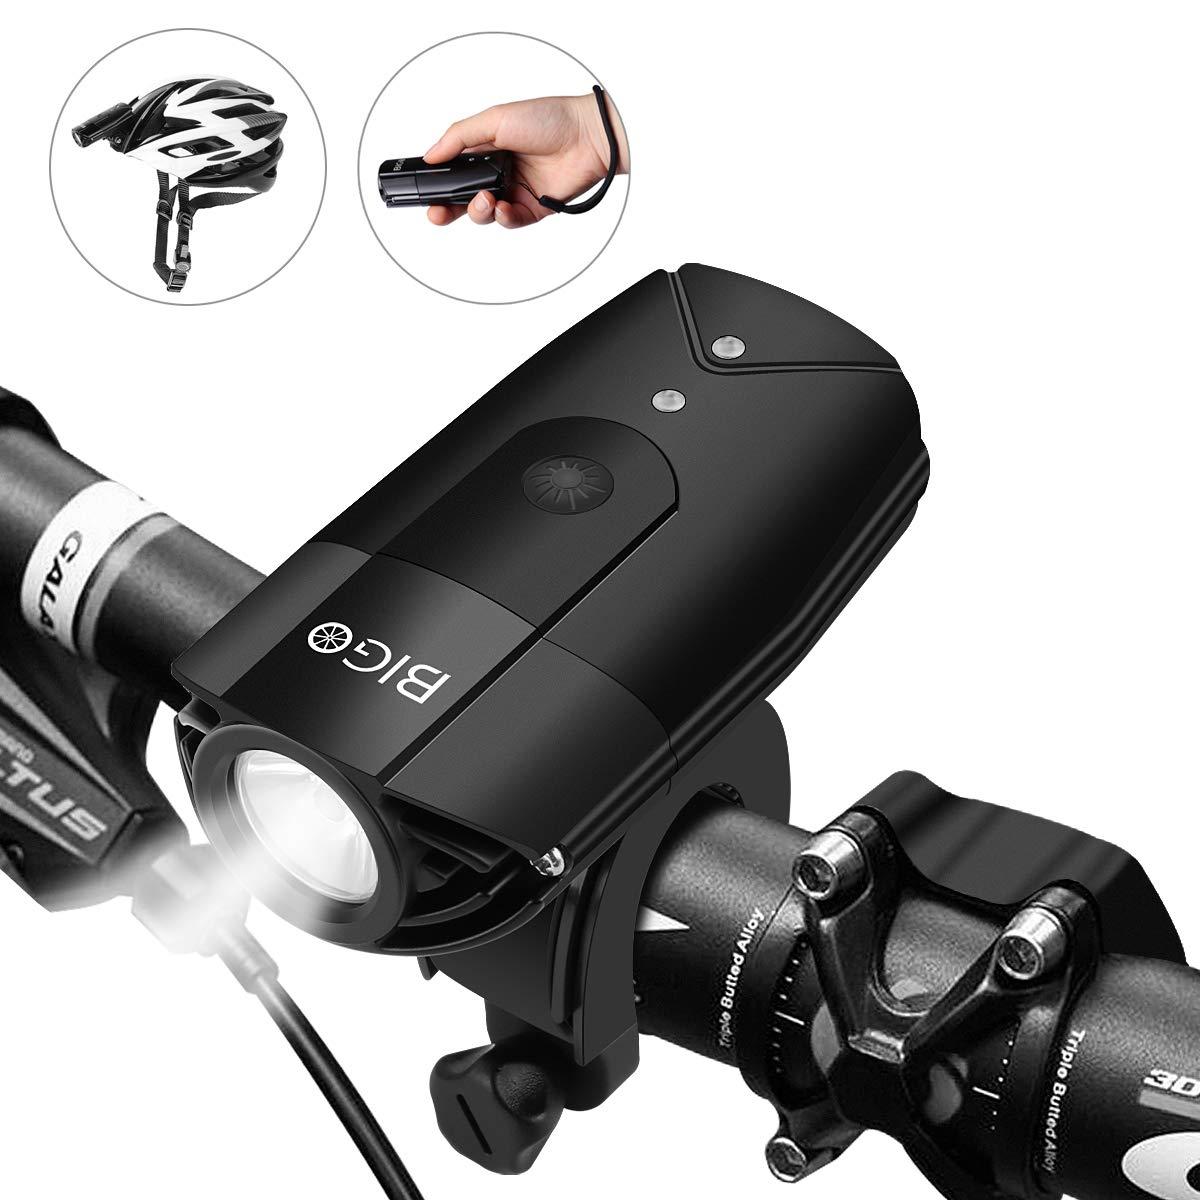 BIGO LED Bike Lights USB Rechargeable Bike Front Light 900 Lumens Super Bright Bicycle Lights Bike Headlight IP65 Waterproof 3 Light Modes Easy to Install for Cycling Safety Flashlight by BIGO (Image #1)